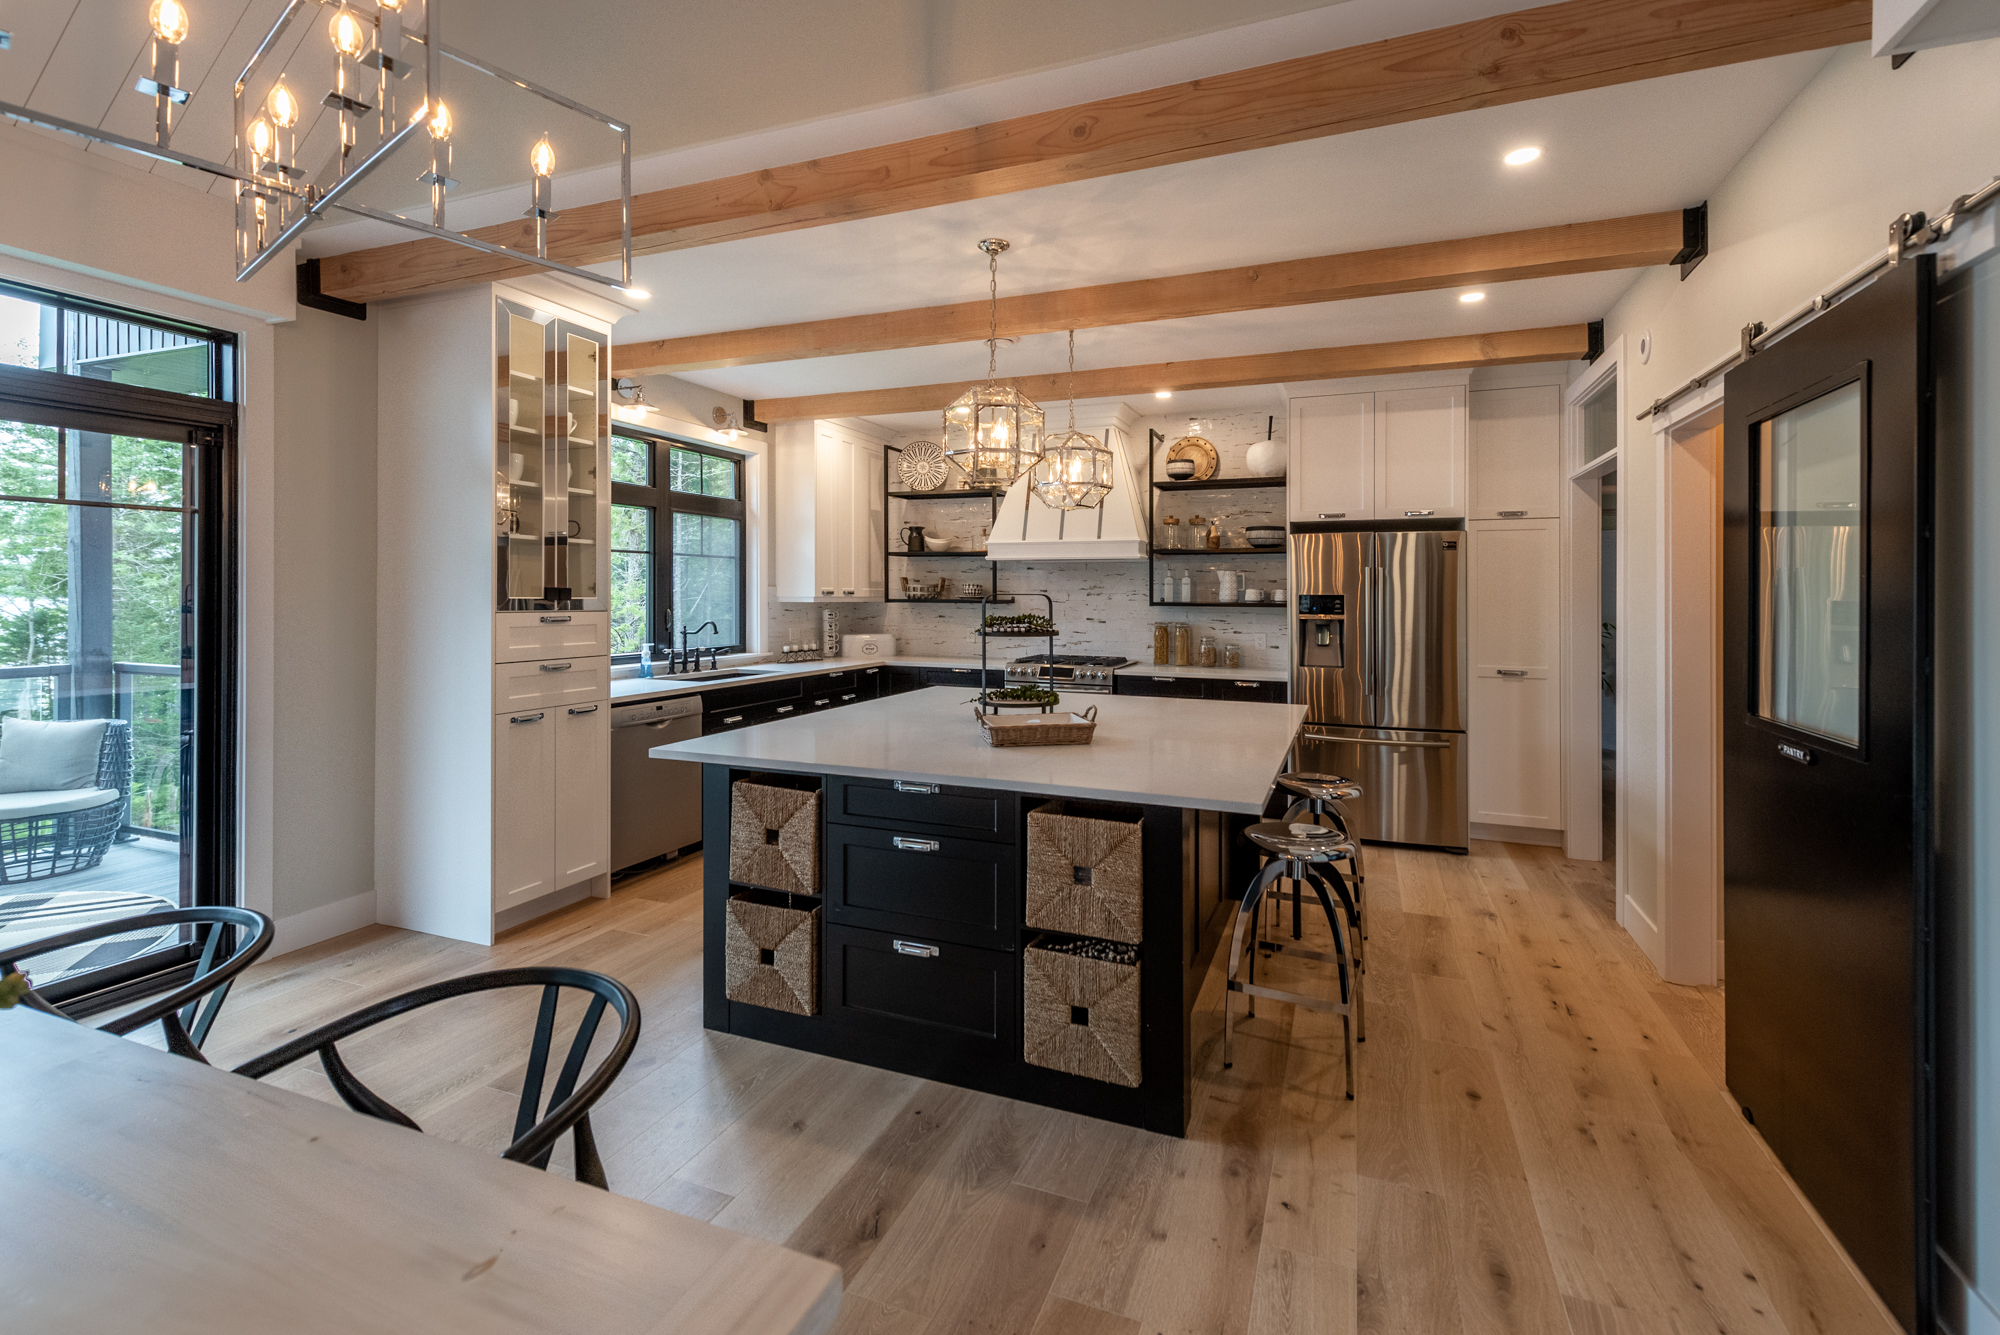 Kitchen diningDAC_7143-HDR_.jpg